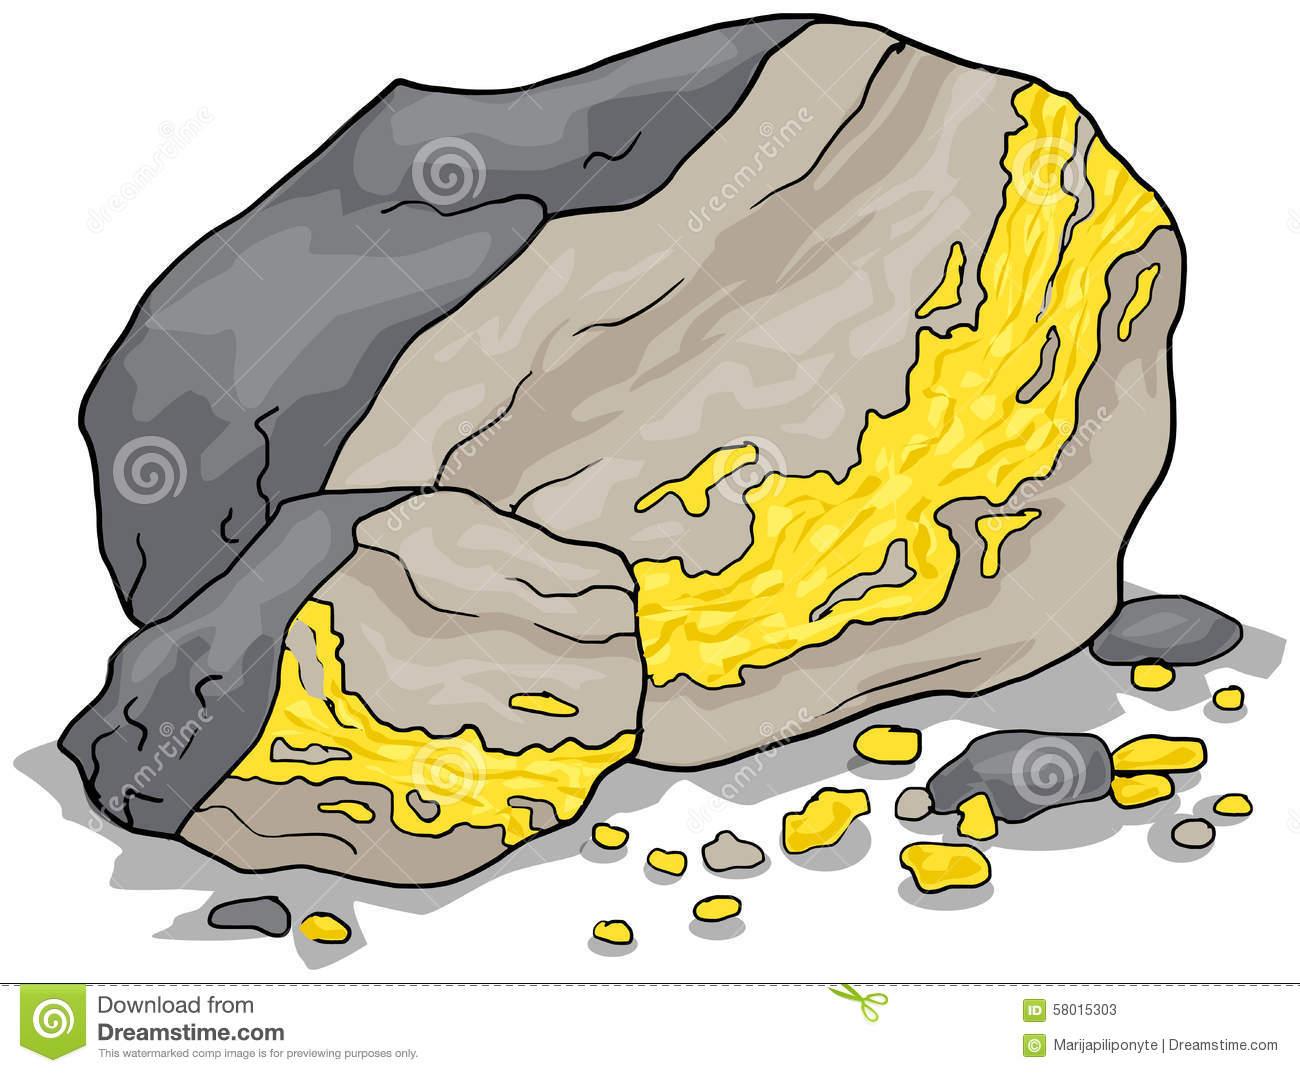 Broken rock clipart image freeuse download Mining clipart broken rock - 43 transparent clip arts, images and ... image freeuse download